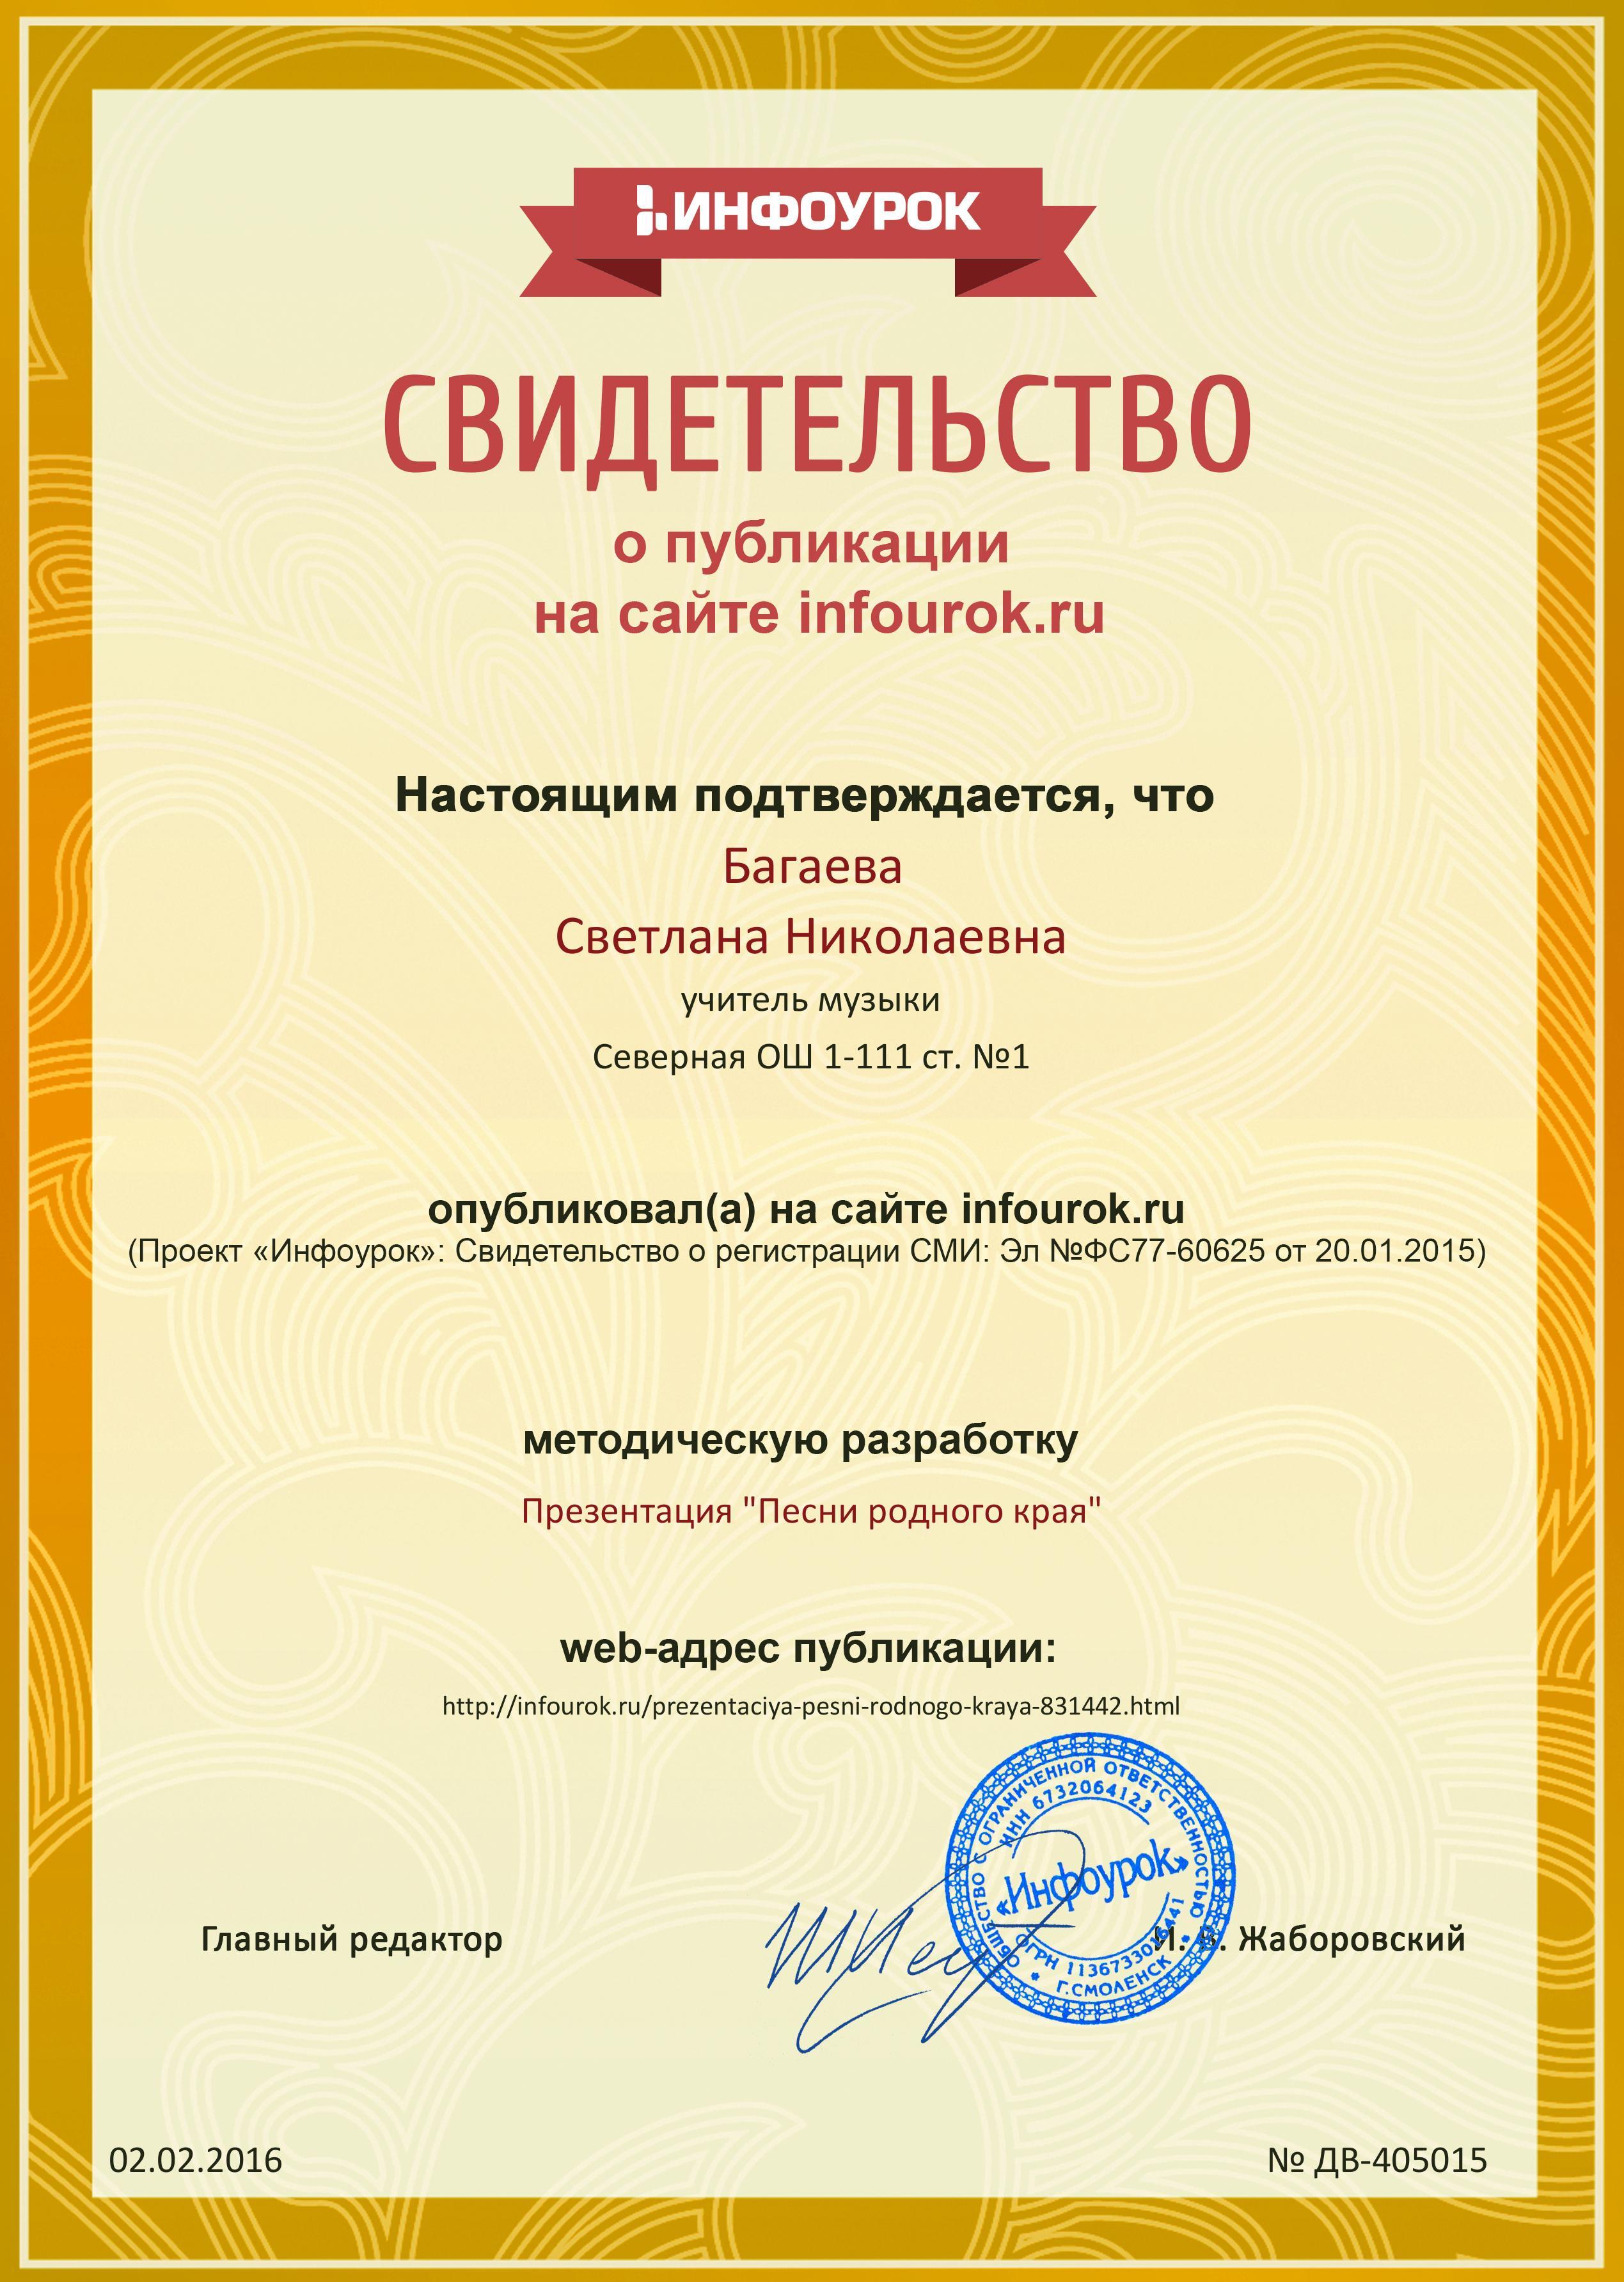 Сертификат проекта infourok.ru № ДВ-405015.jpg